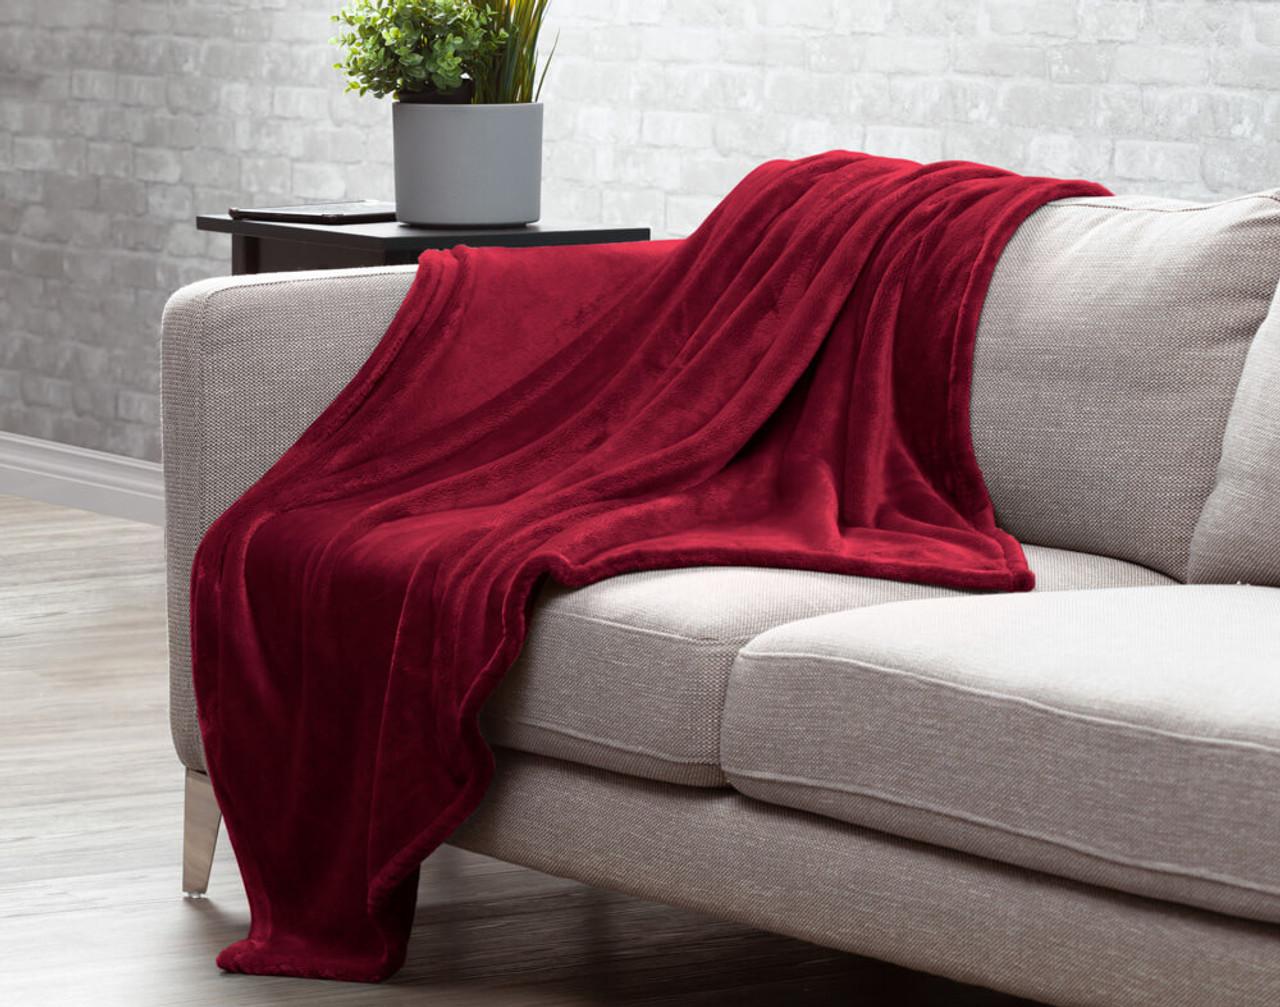 Velveteen Fleece Throw - Poinsettia